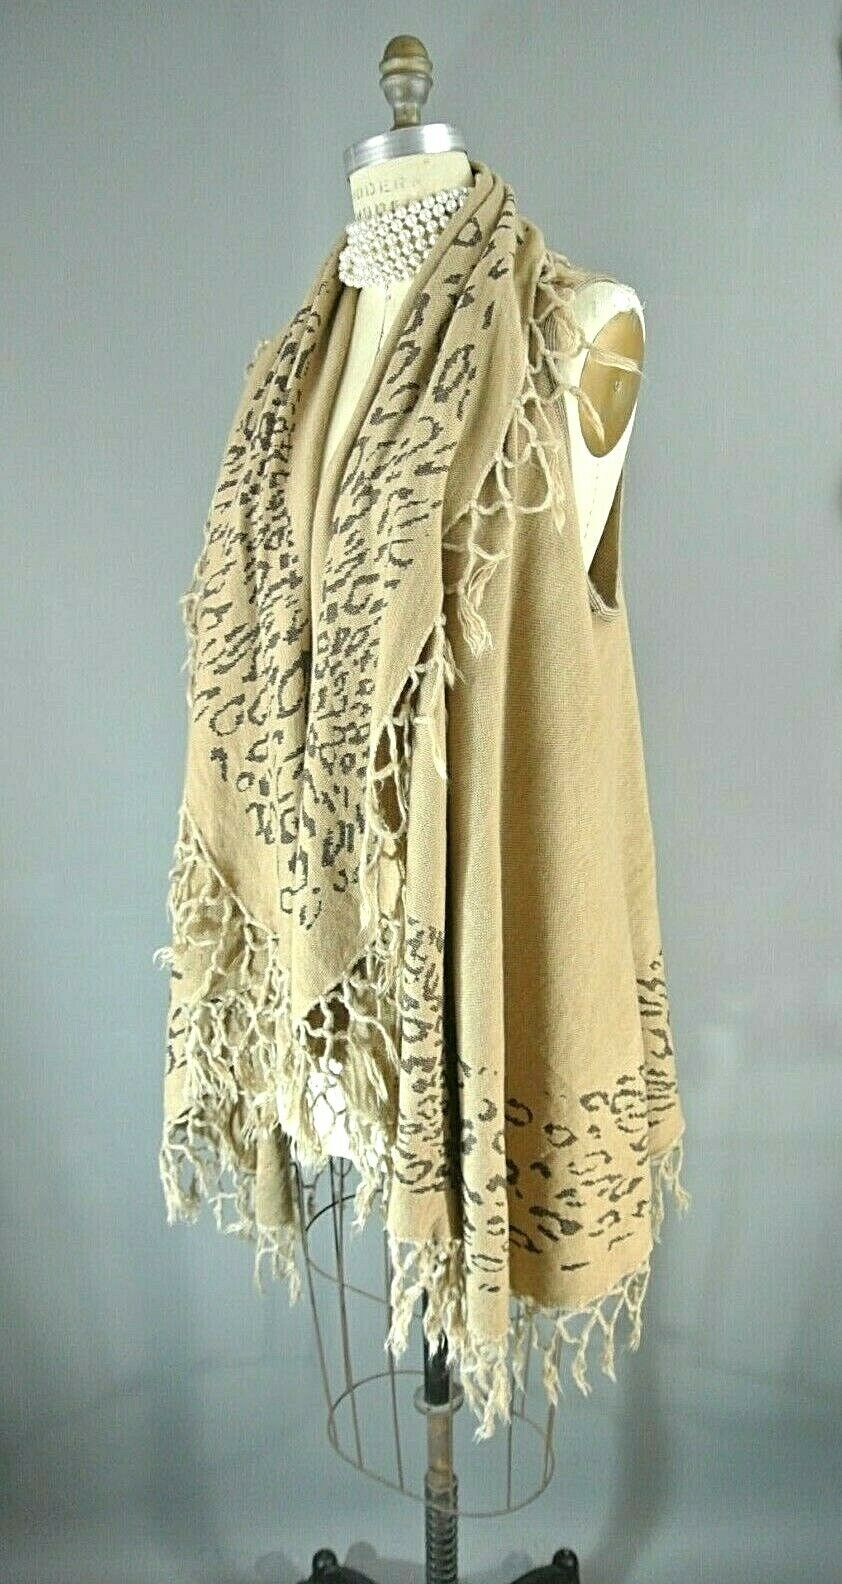 Raj Women's Sleeveless Cardigan Vest Vest Vest One Size Beige Cheetah Print Fringe NEW d63414